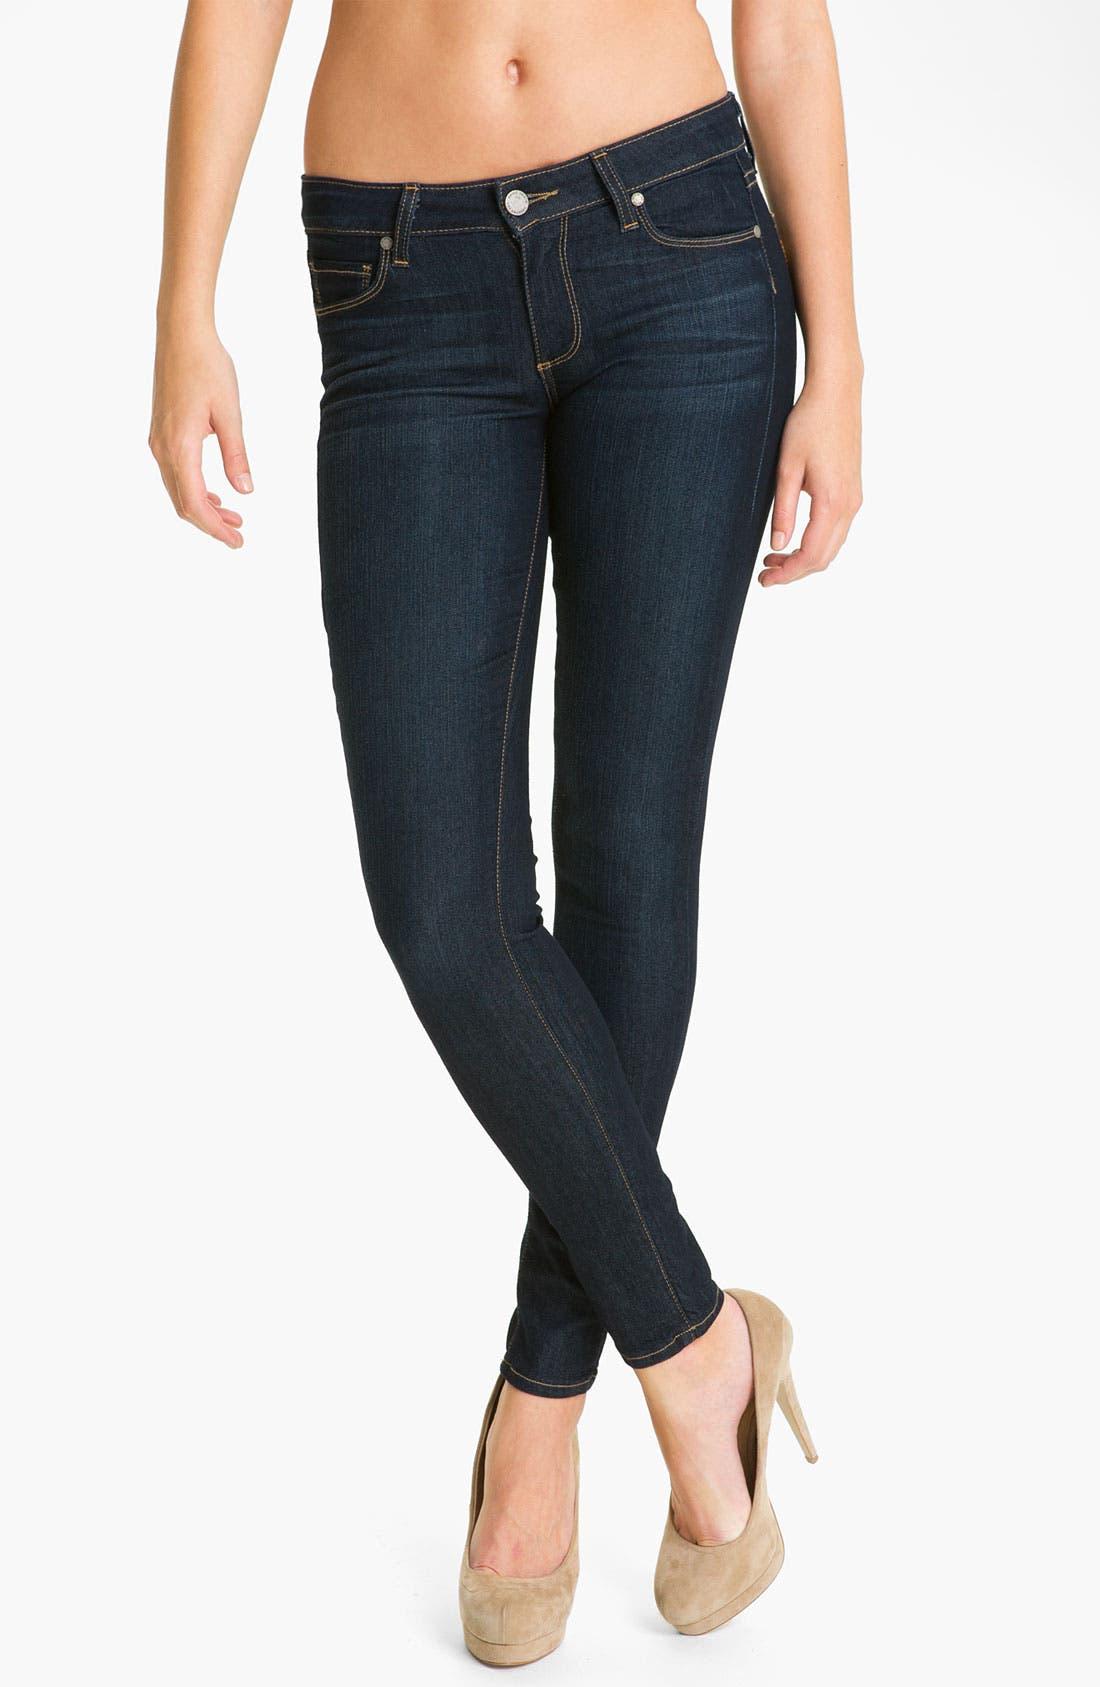 Alternate Image 1 Selected - Paige Denim 'Verdugo' Stretch Skinny Jeans (Stream)